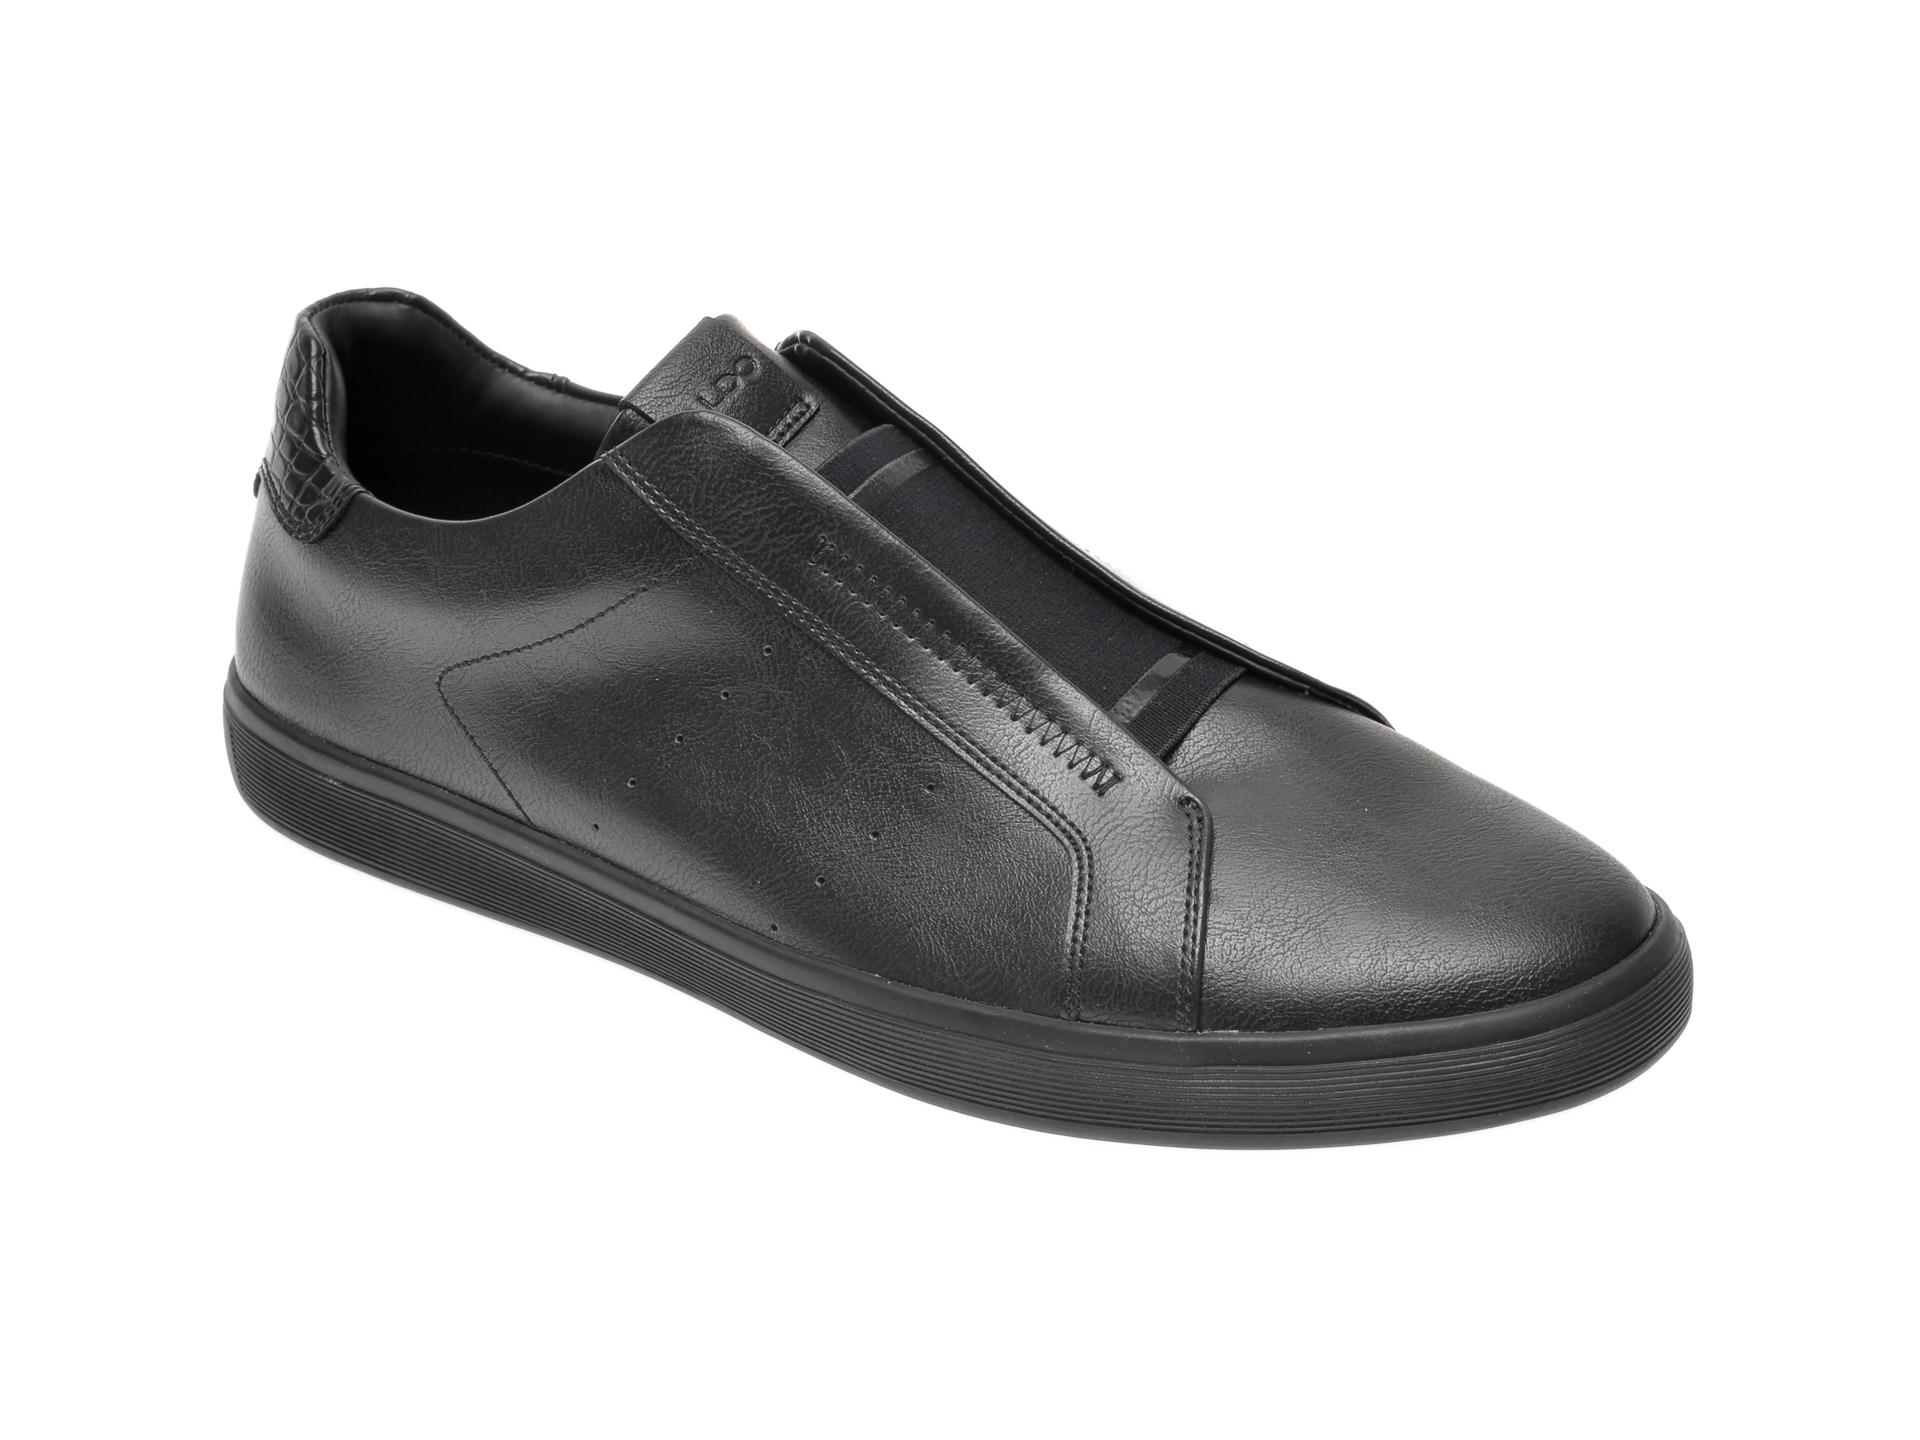 Pantofi ALDO negri, Boomerang001, din piele ecologica imagine